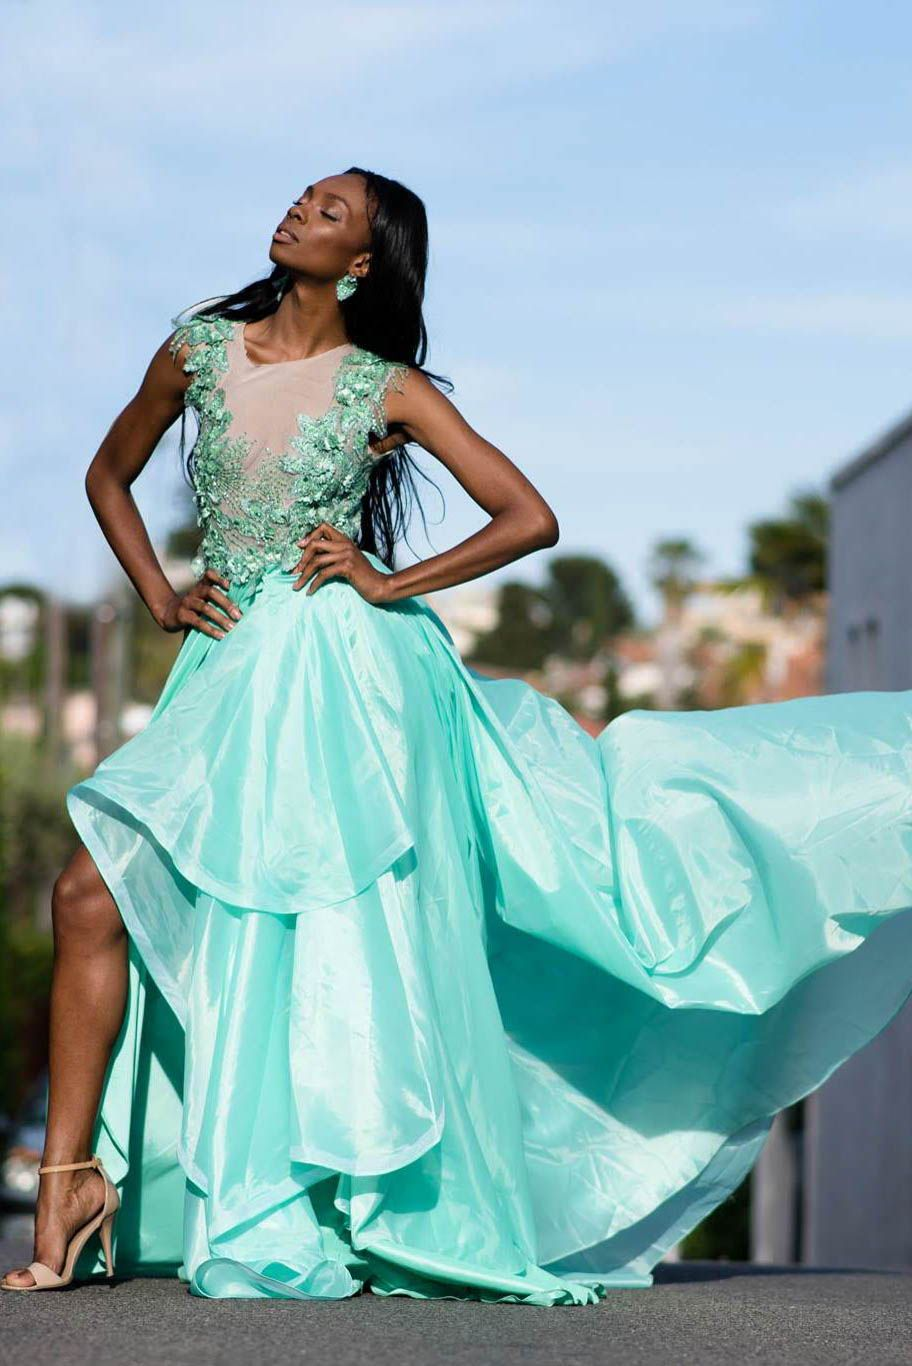 Didomenico Design L Kelsy Dominick L Dmv Designer L Washington Dc Fashion Designer L Custom Dress L Couture Custom Dresses Couture Gowns Boutique Dresses